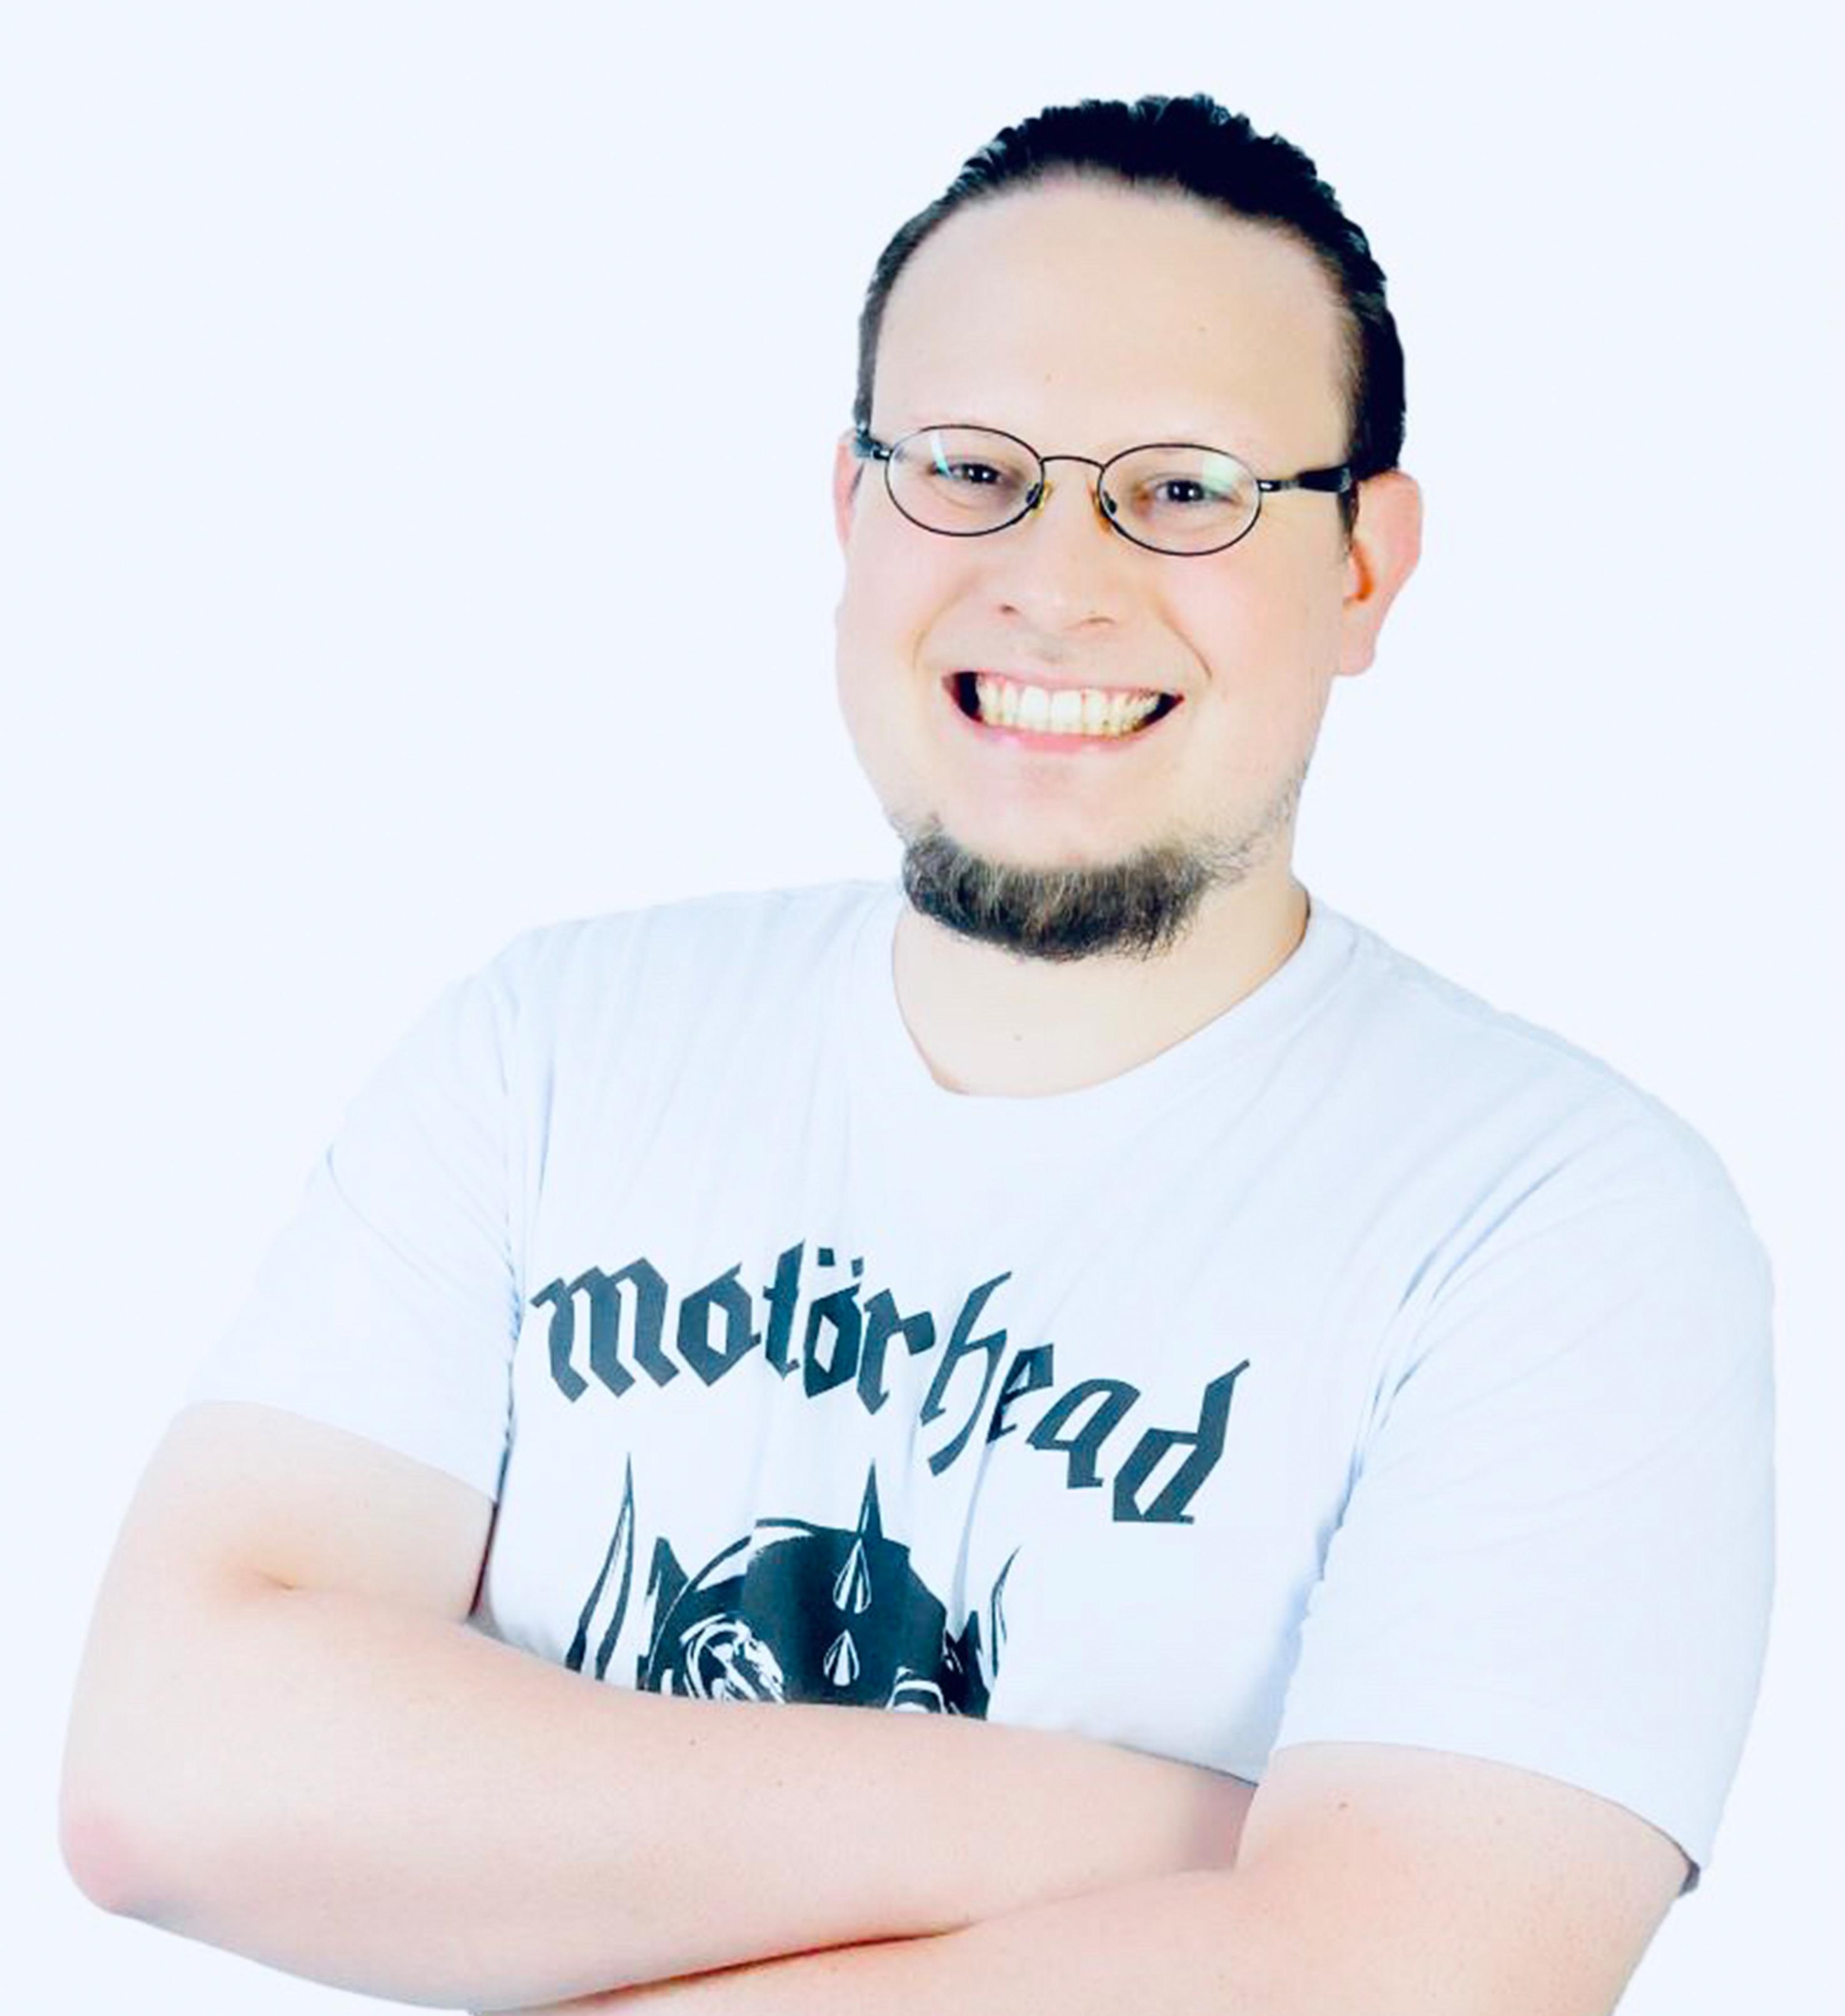 Rafael Meneguzzi Serrano